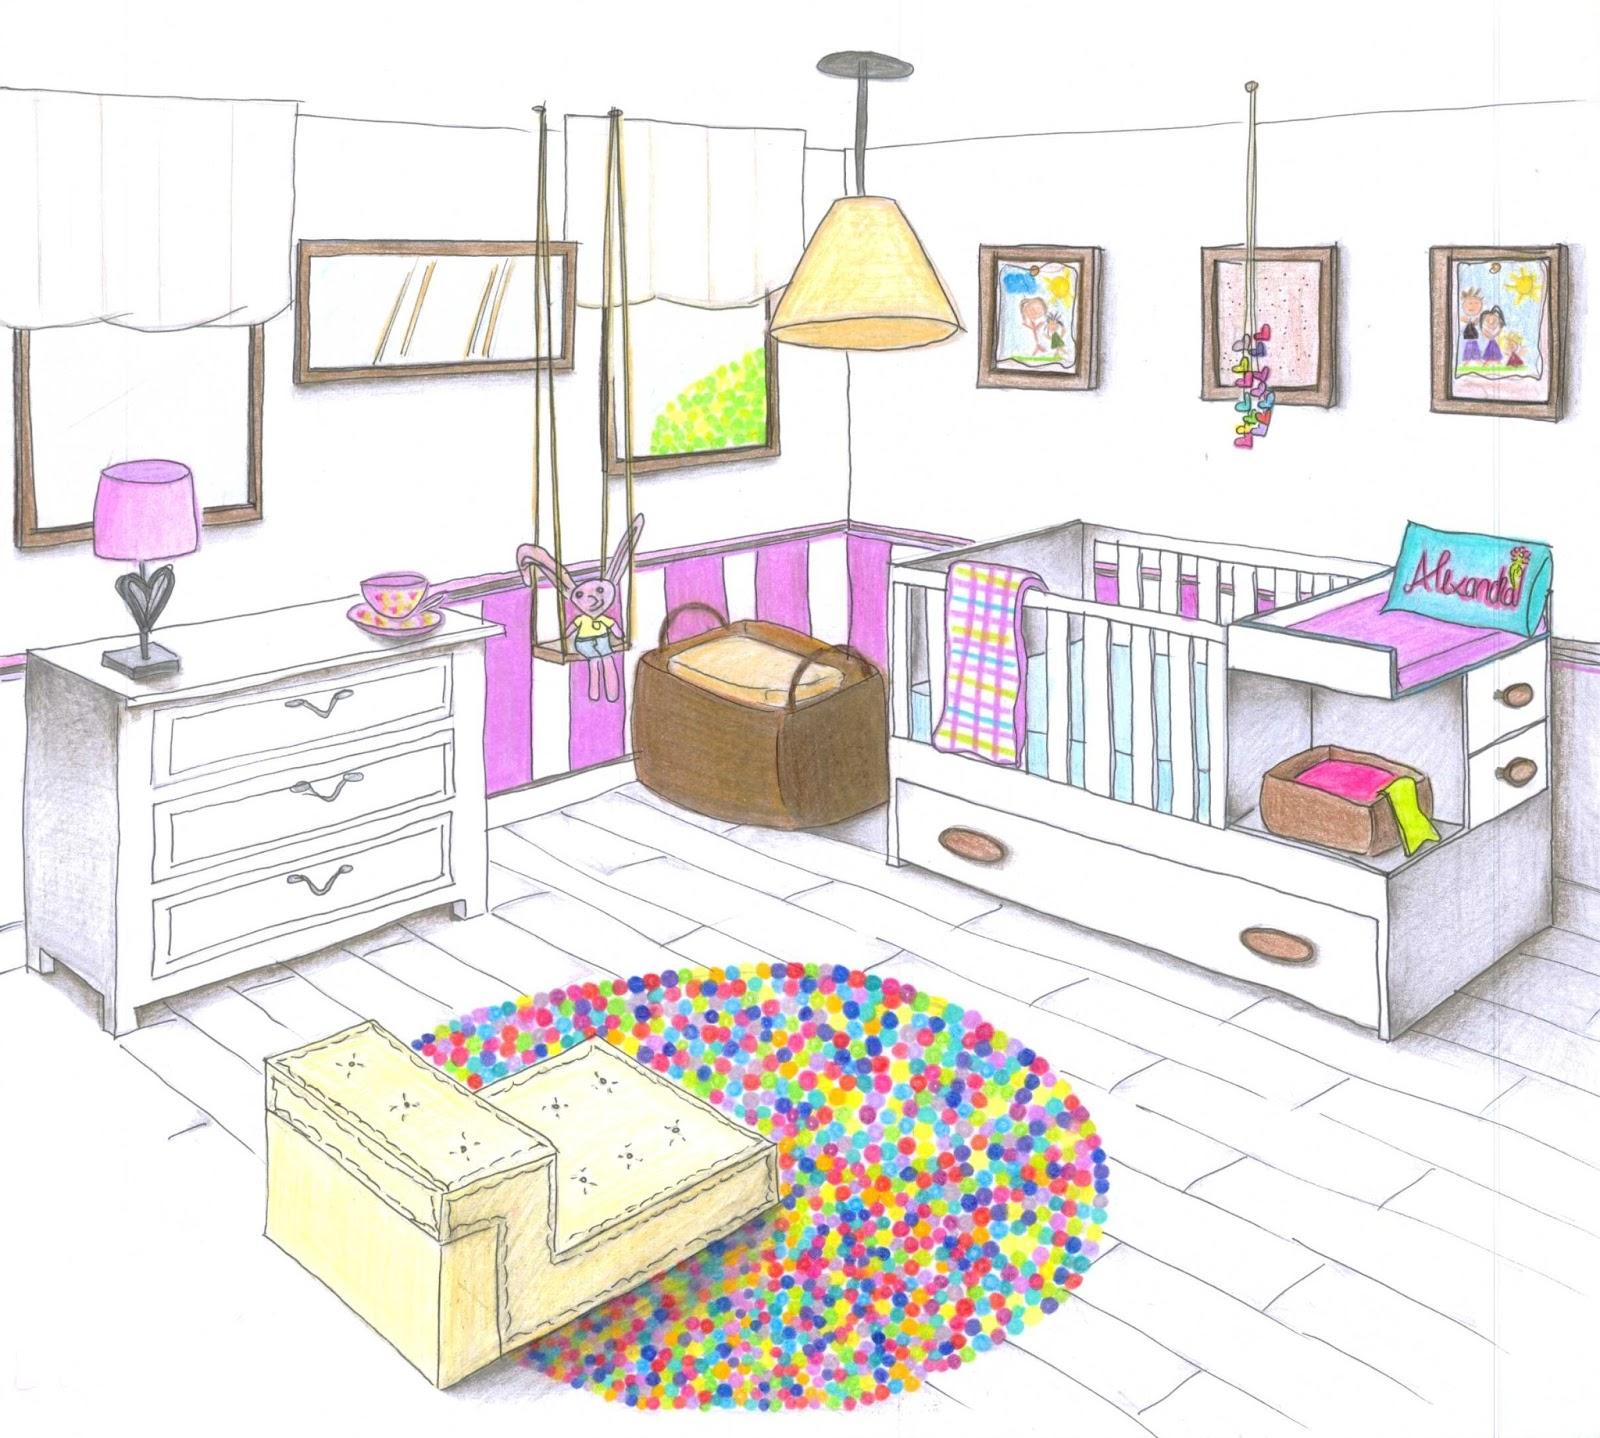 Dise o interior for Diseno de interiores dibujos